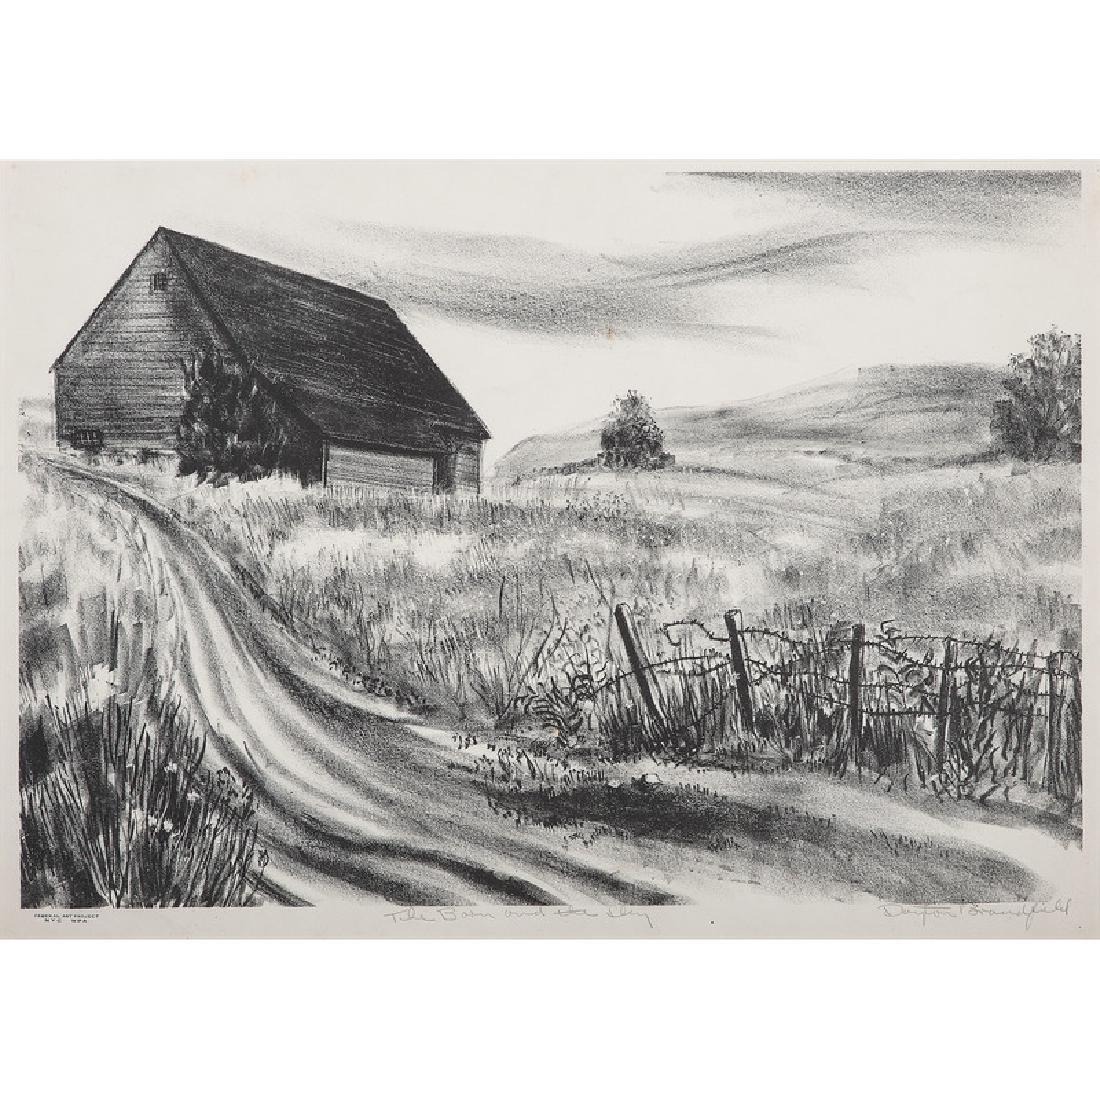 Dayton Brandfield (American, 1911-1993)